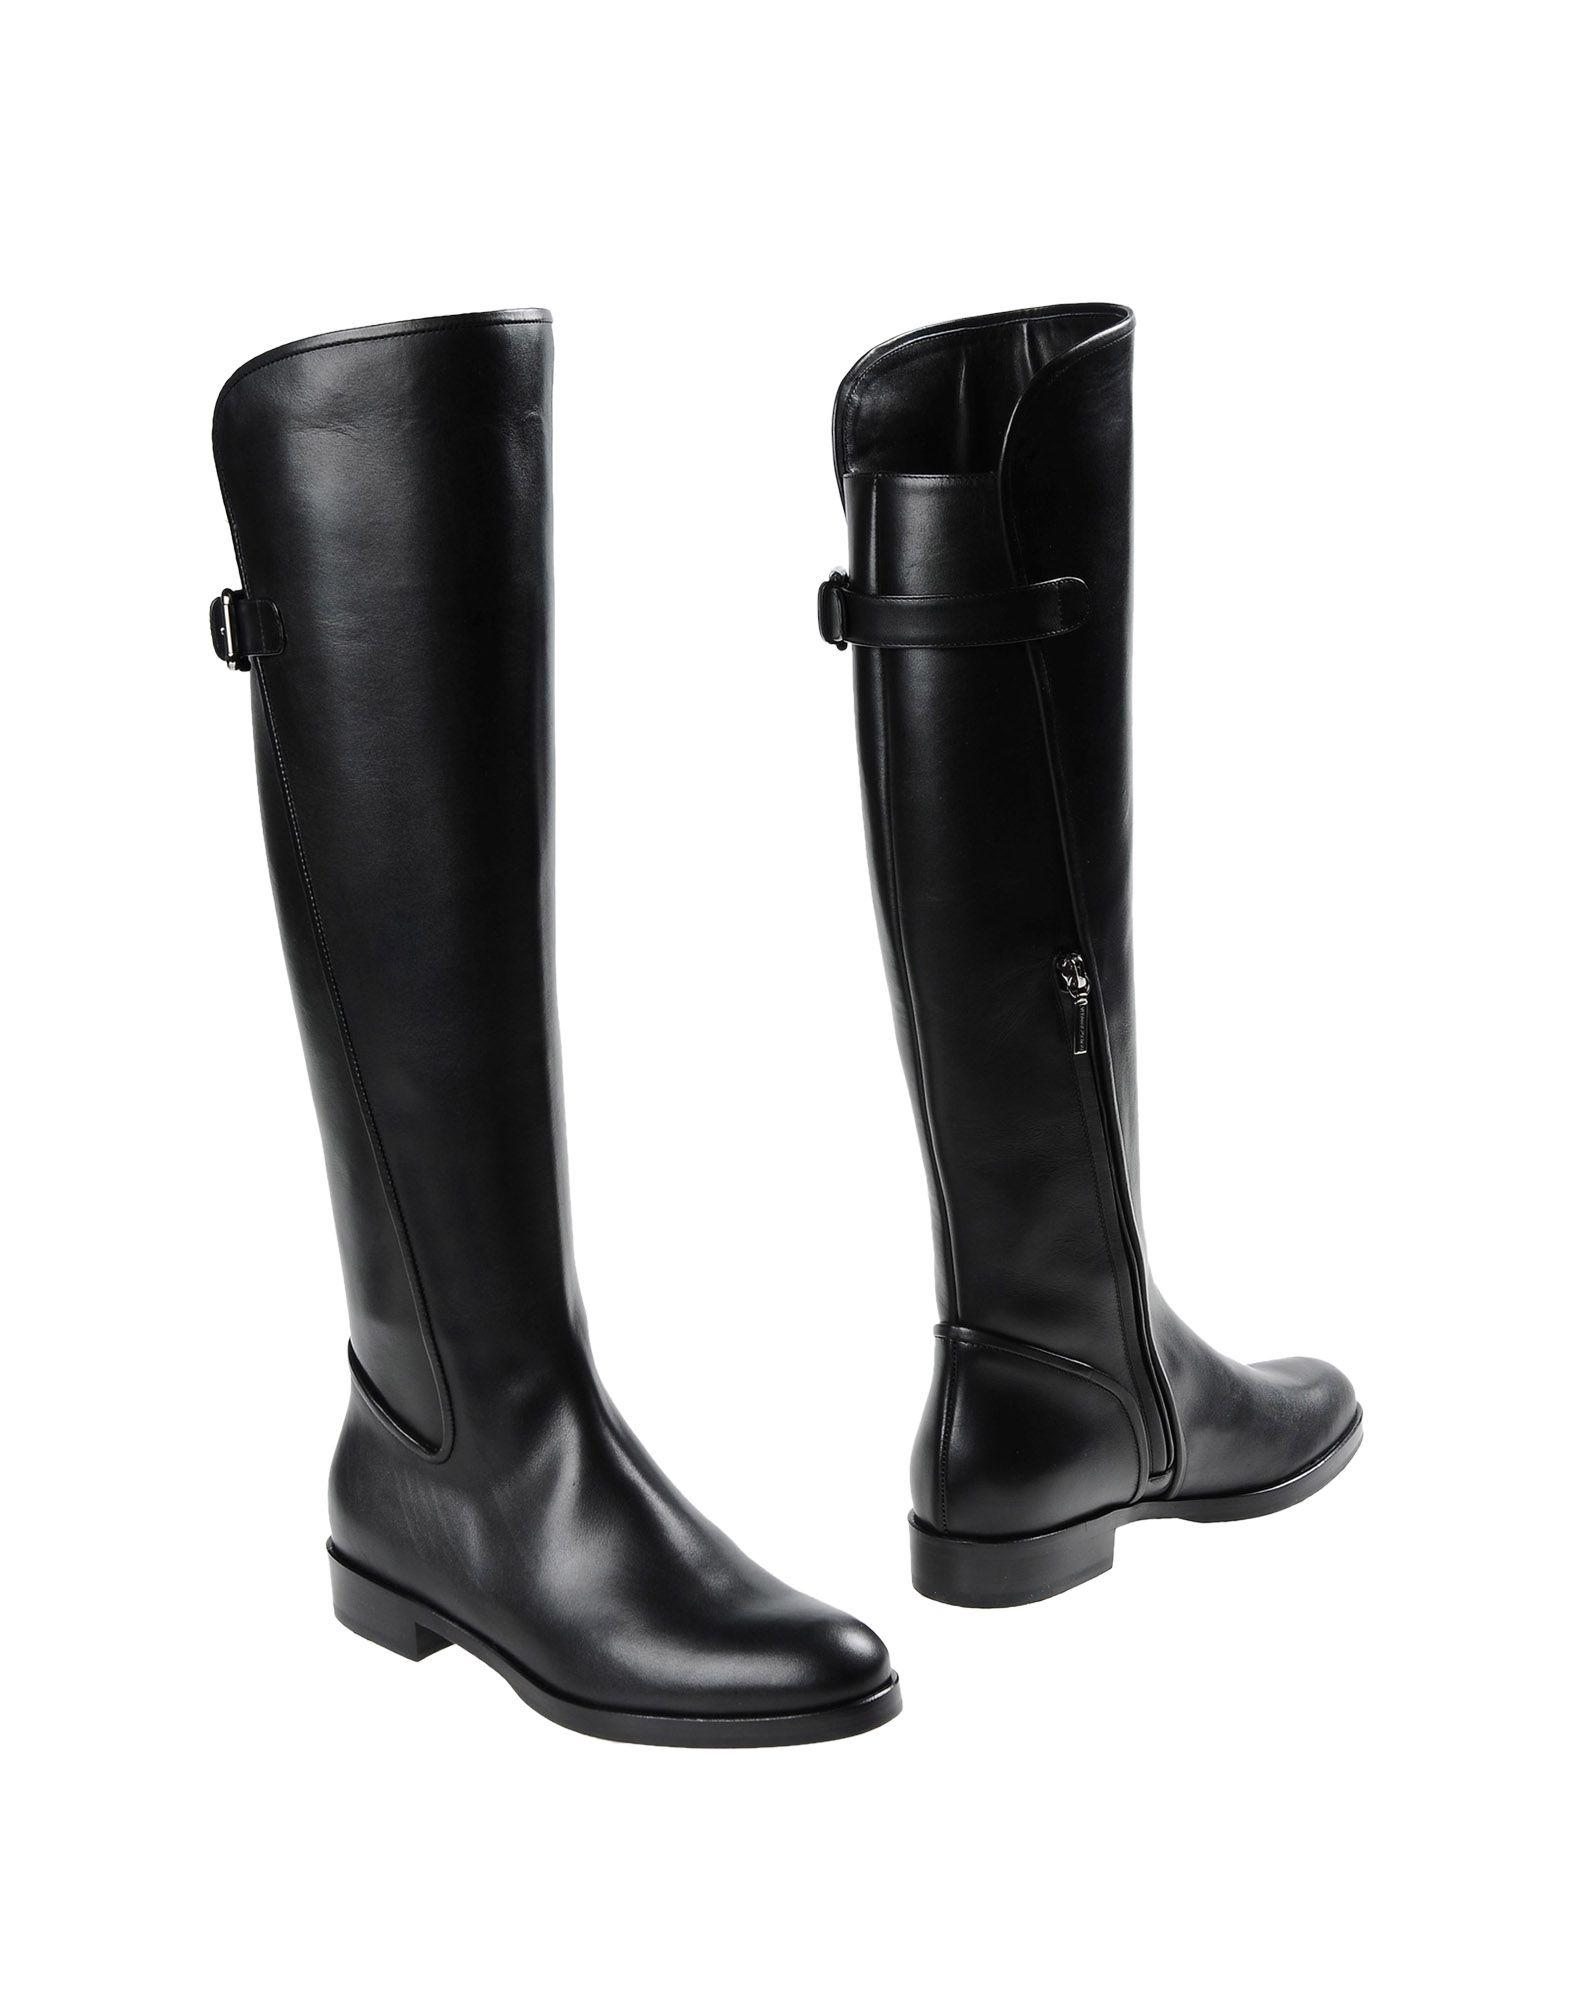 Dolce & Gabbana Boots - Women Dolce & Gabbana Boots - online on  Canada - Boots 11066514ID fef203